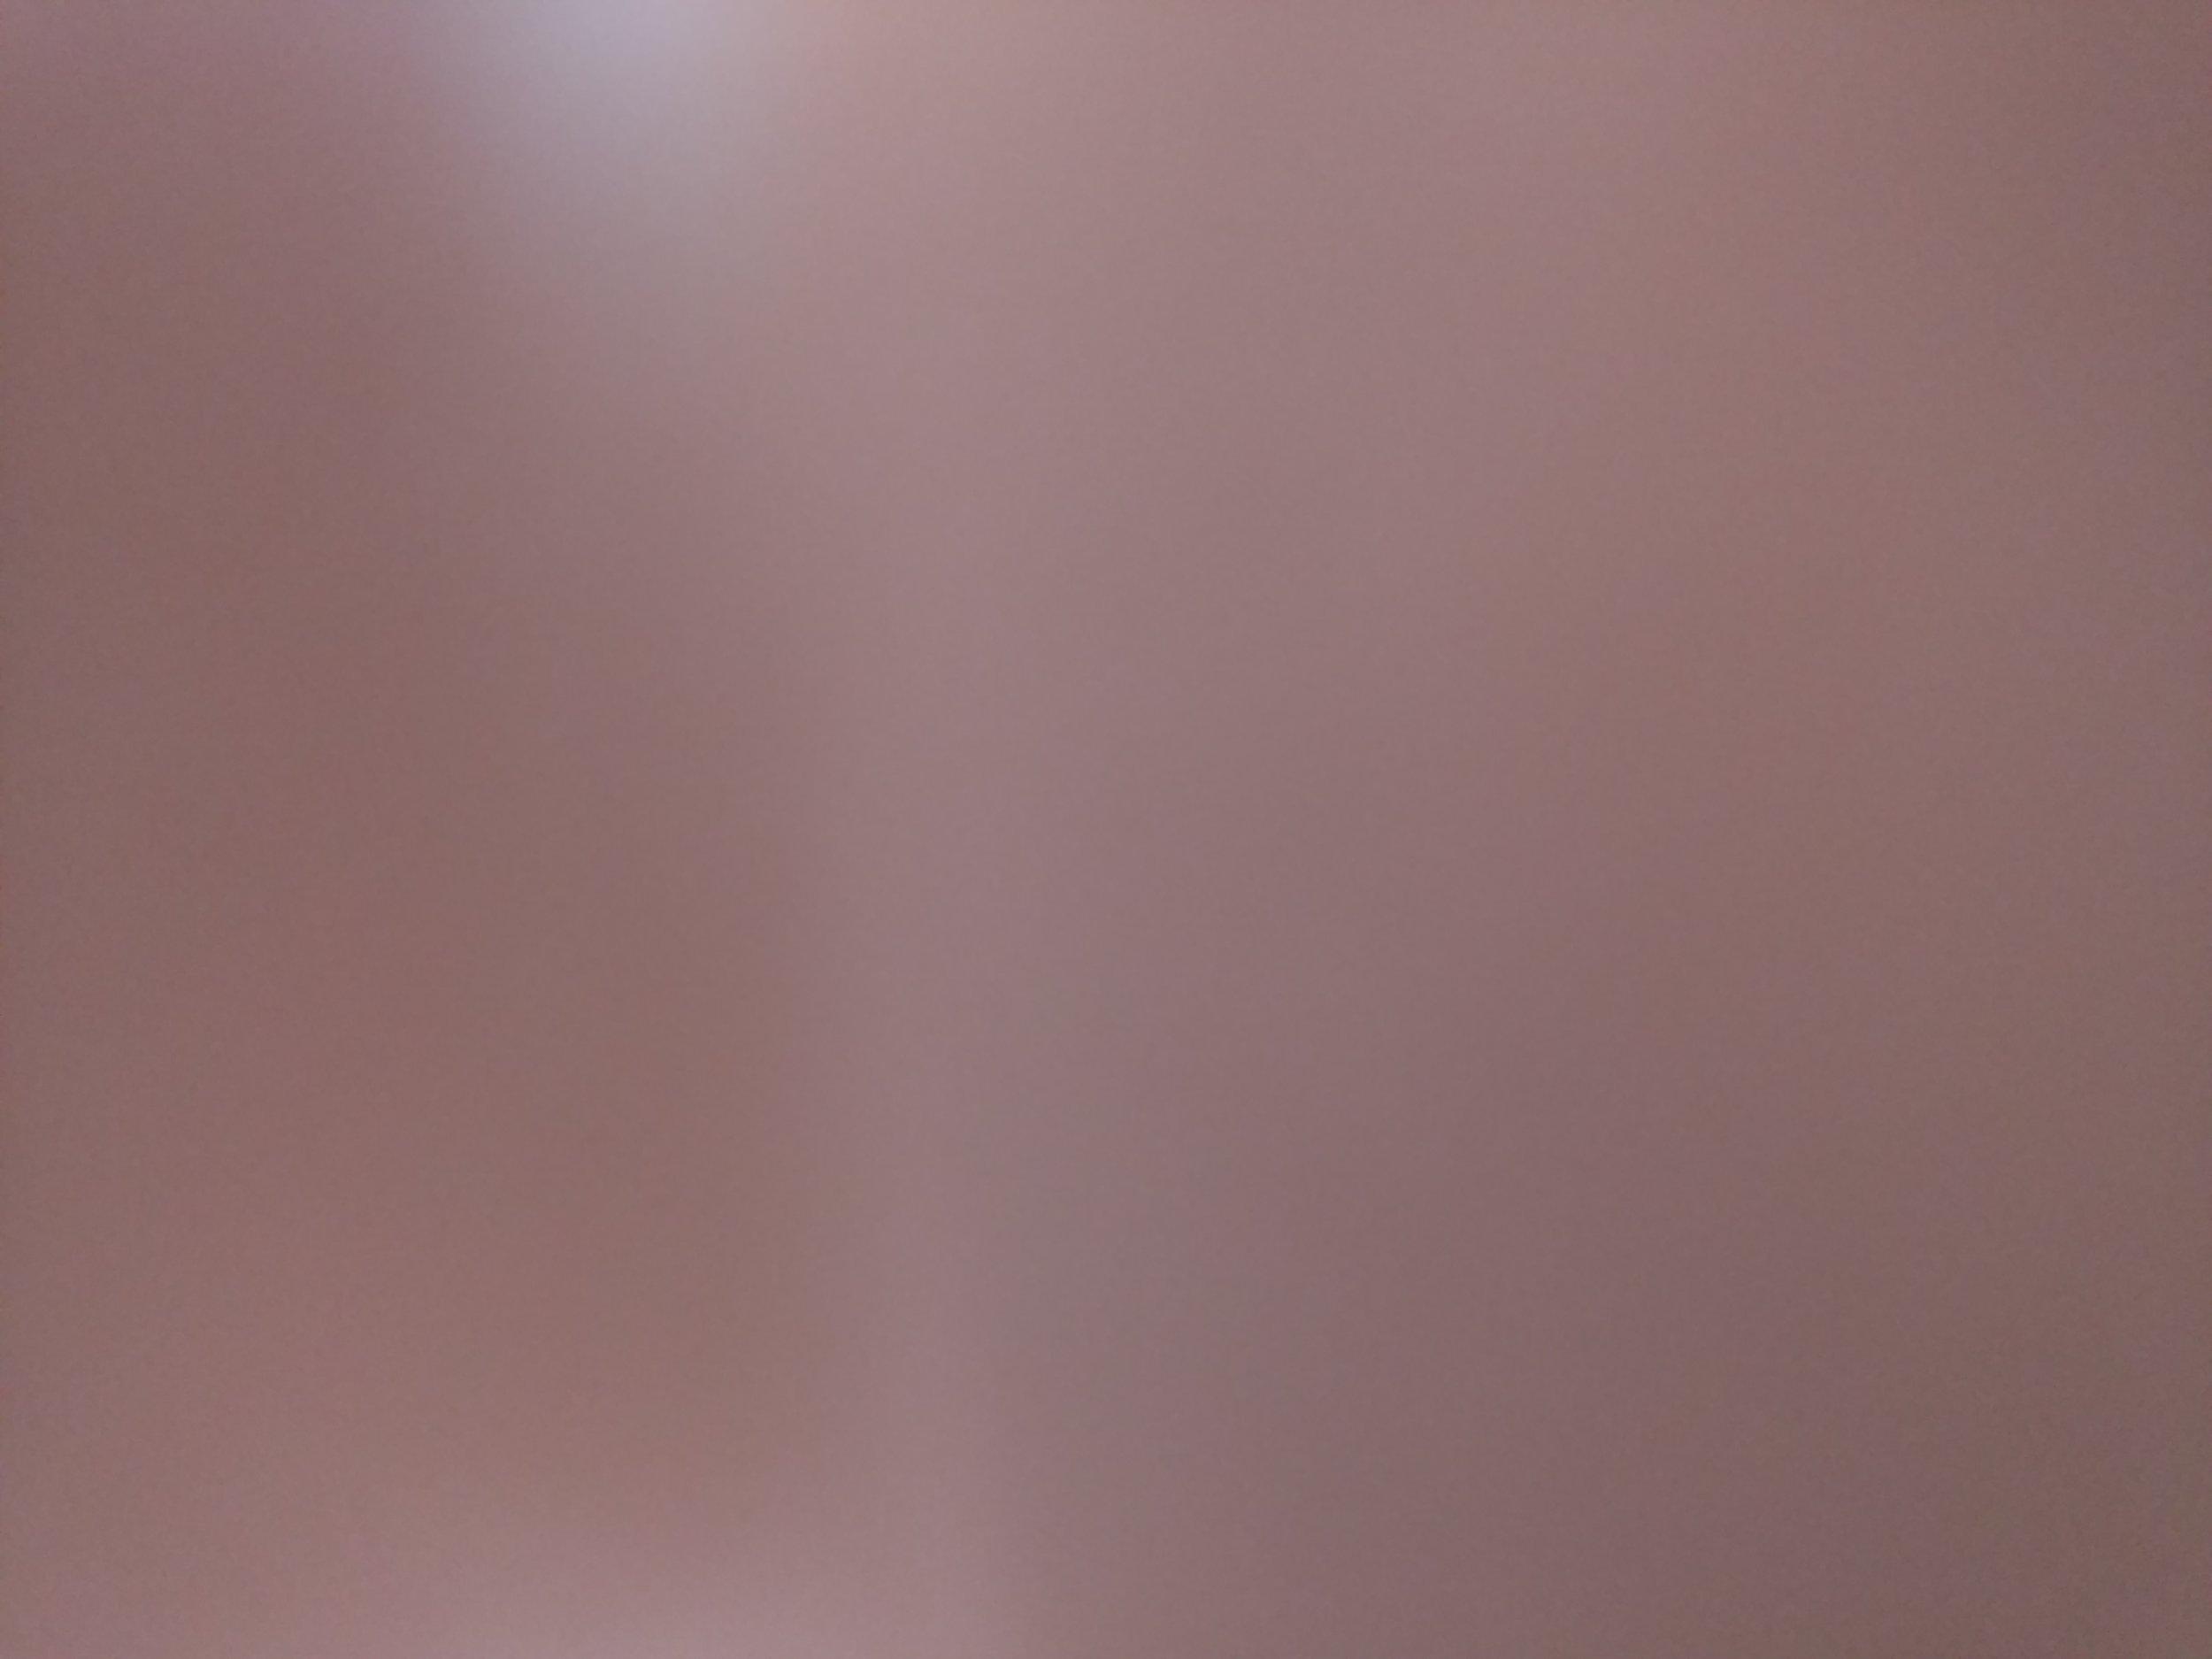 willroth-co-free-texture-gradient-018.jpg